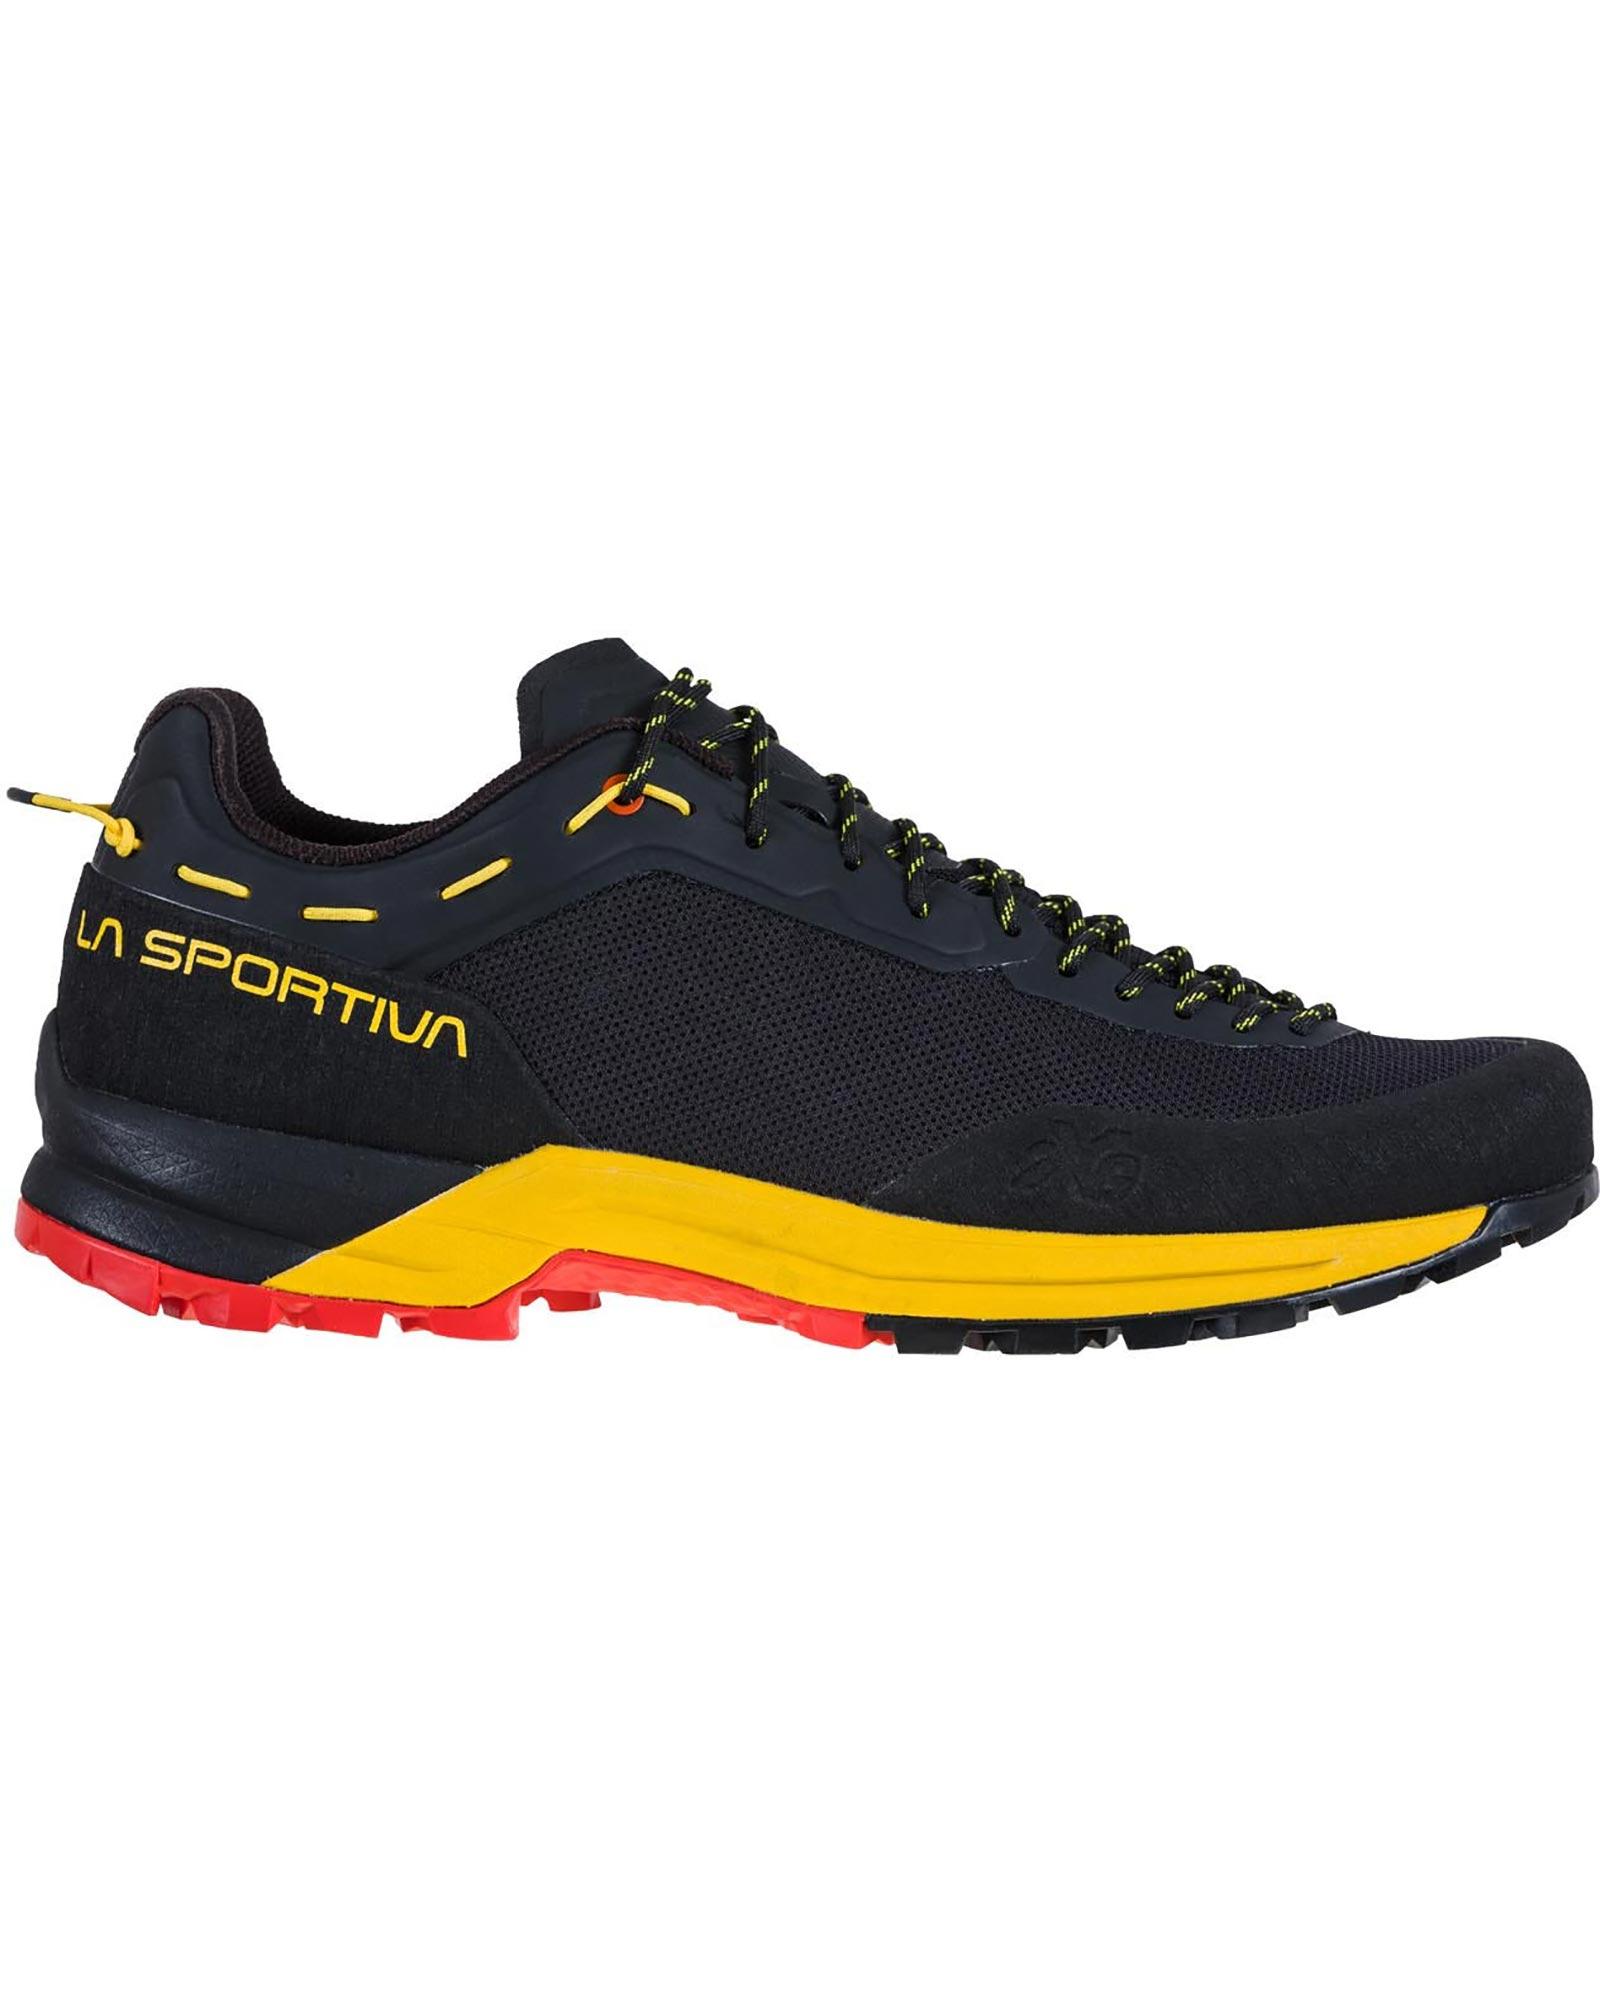 La Sportiva TX Guide Men's Shoes 0